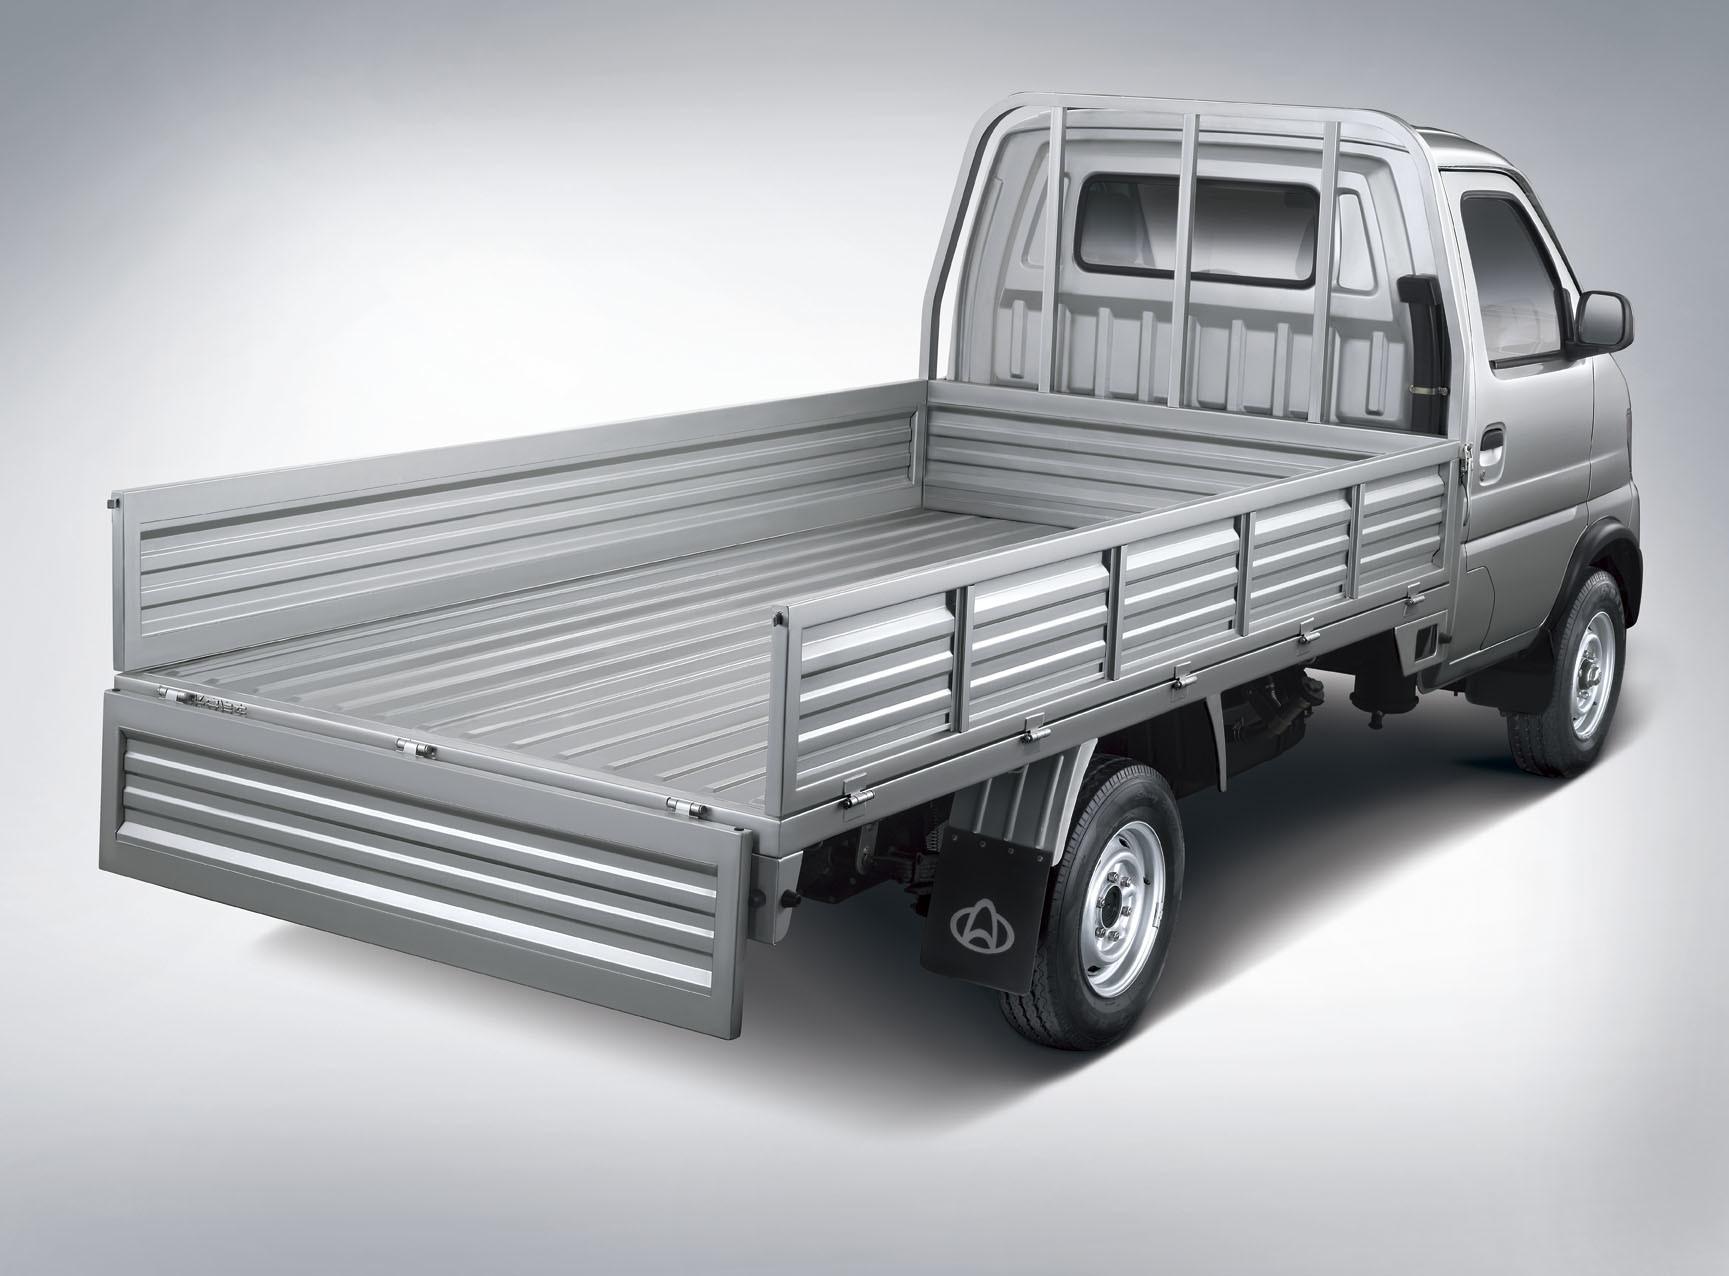 8X4 Tipper, Dump Truck, Heavy Duty Truck